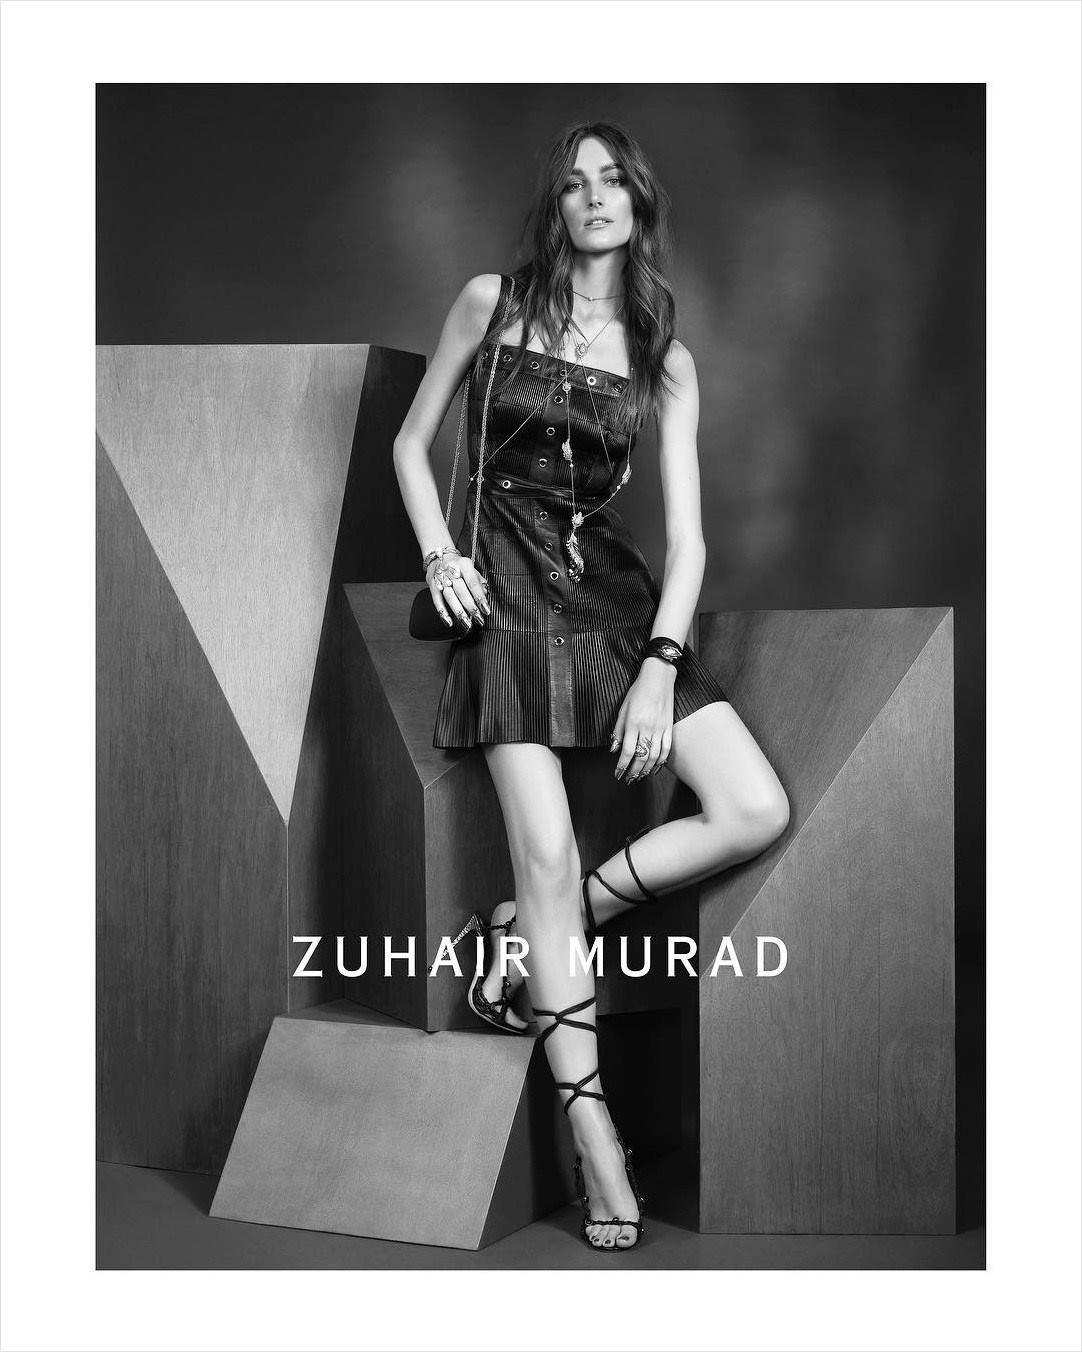 Zuhair Murad | Spring 2018 Campaign ft. Josephine Le Tutour